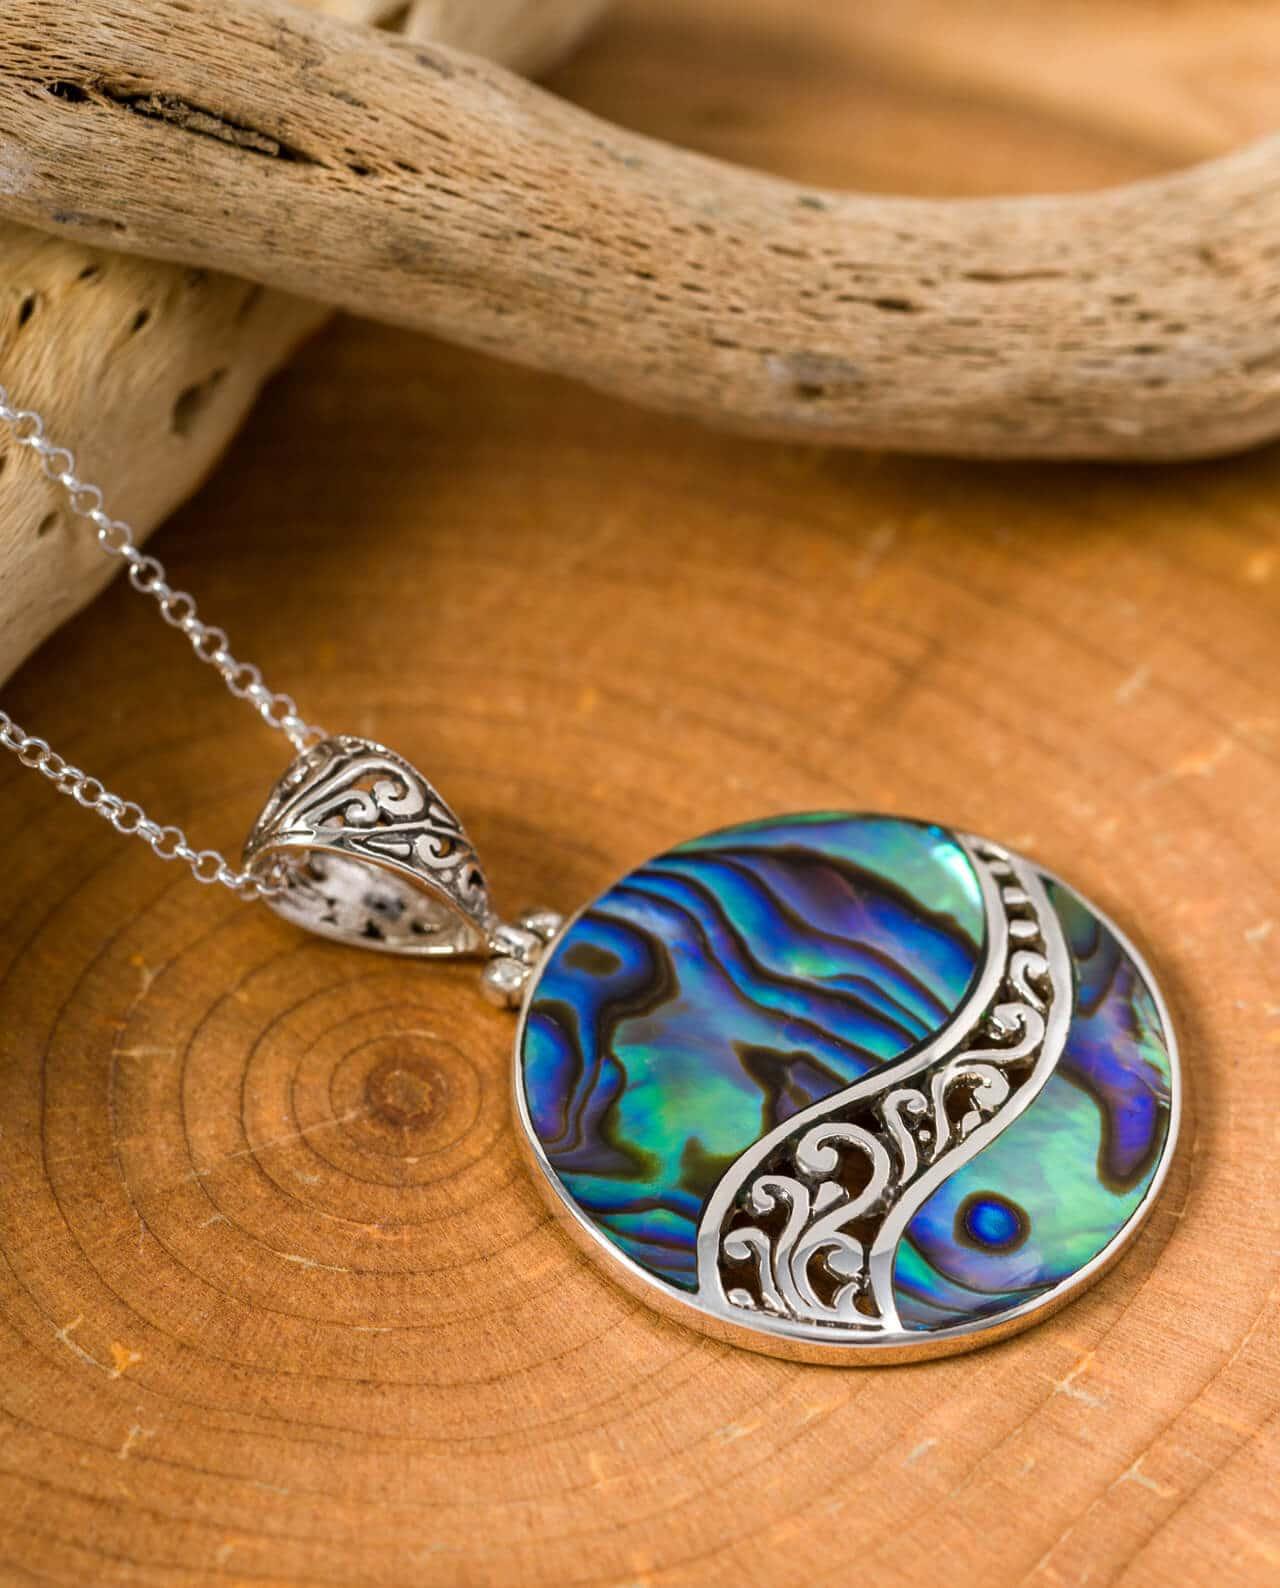 CONLIGHT Abalone Paua Perlmut Anheanger